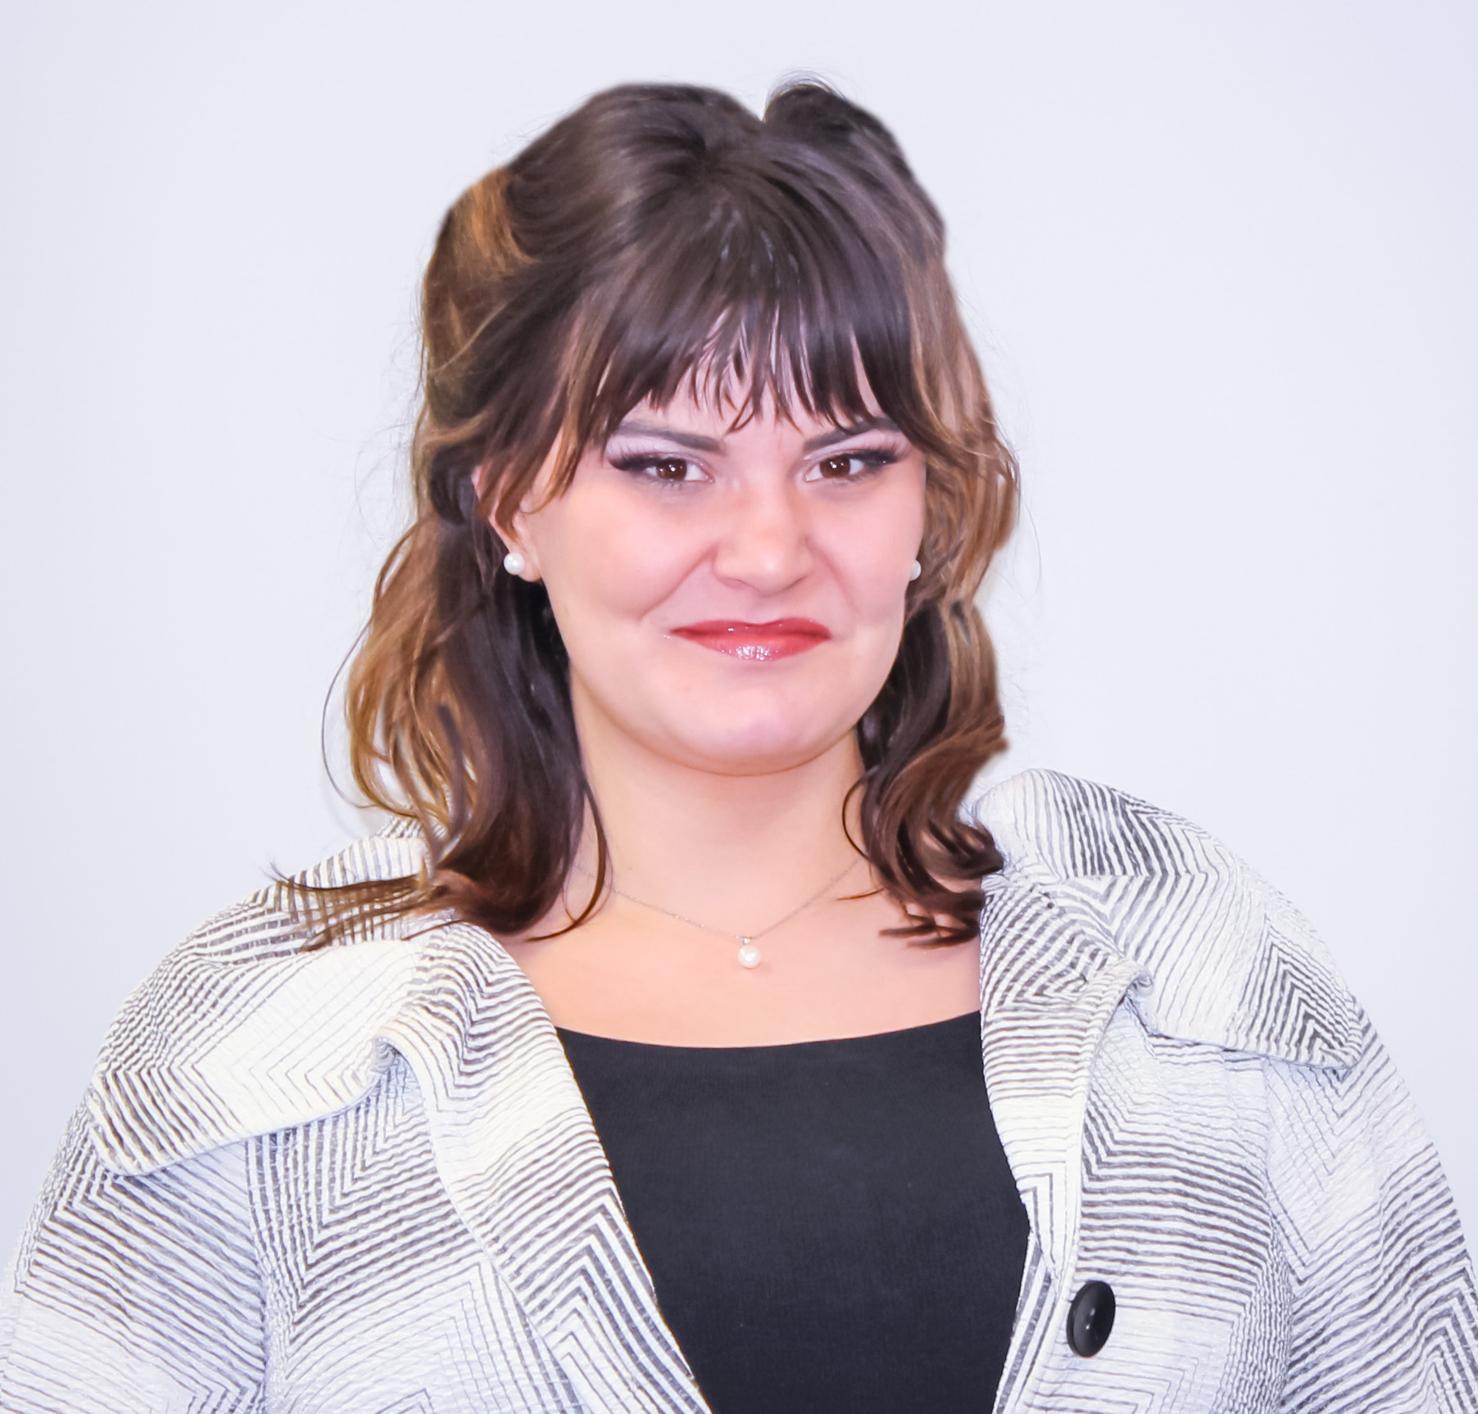 Briana Marxen-McCollom